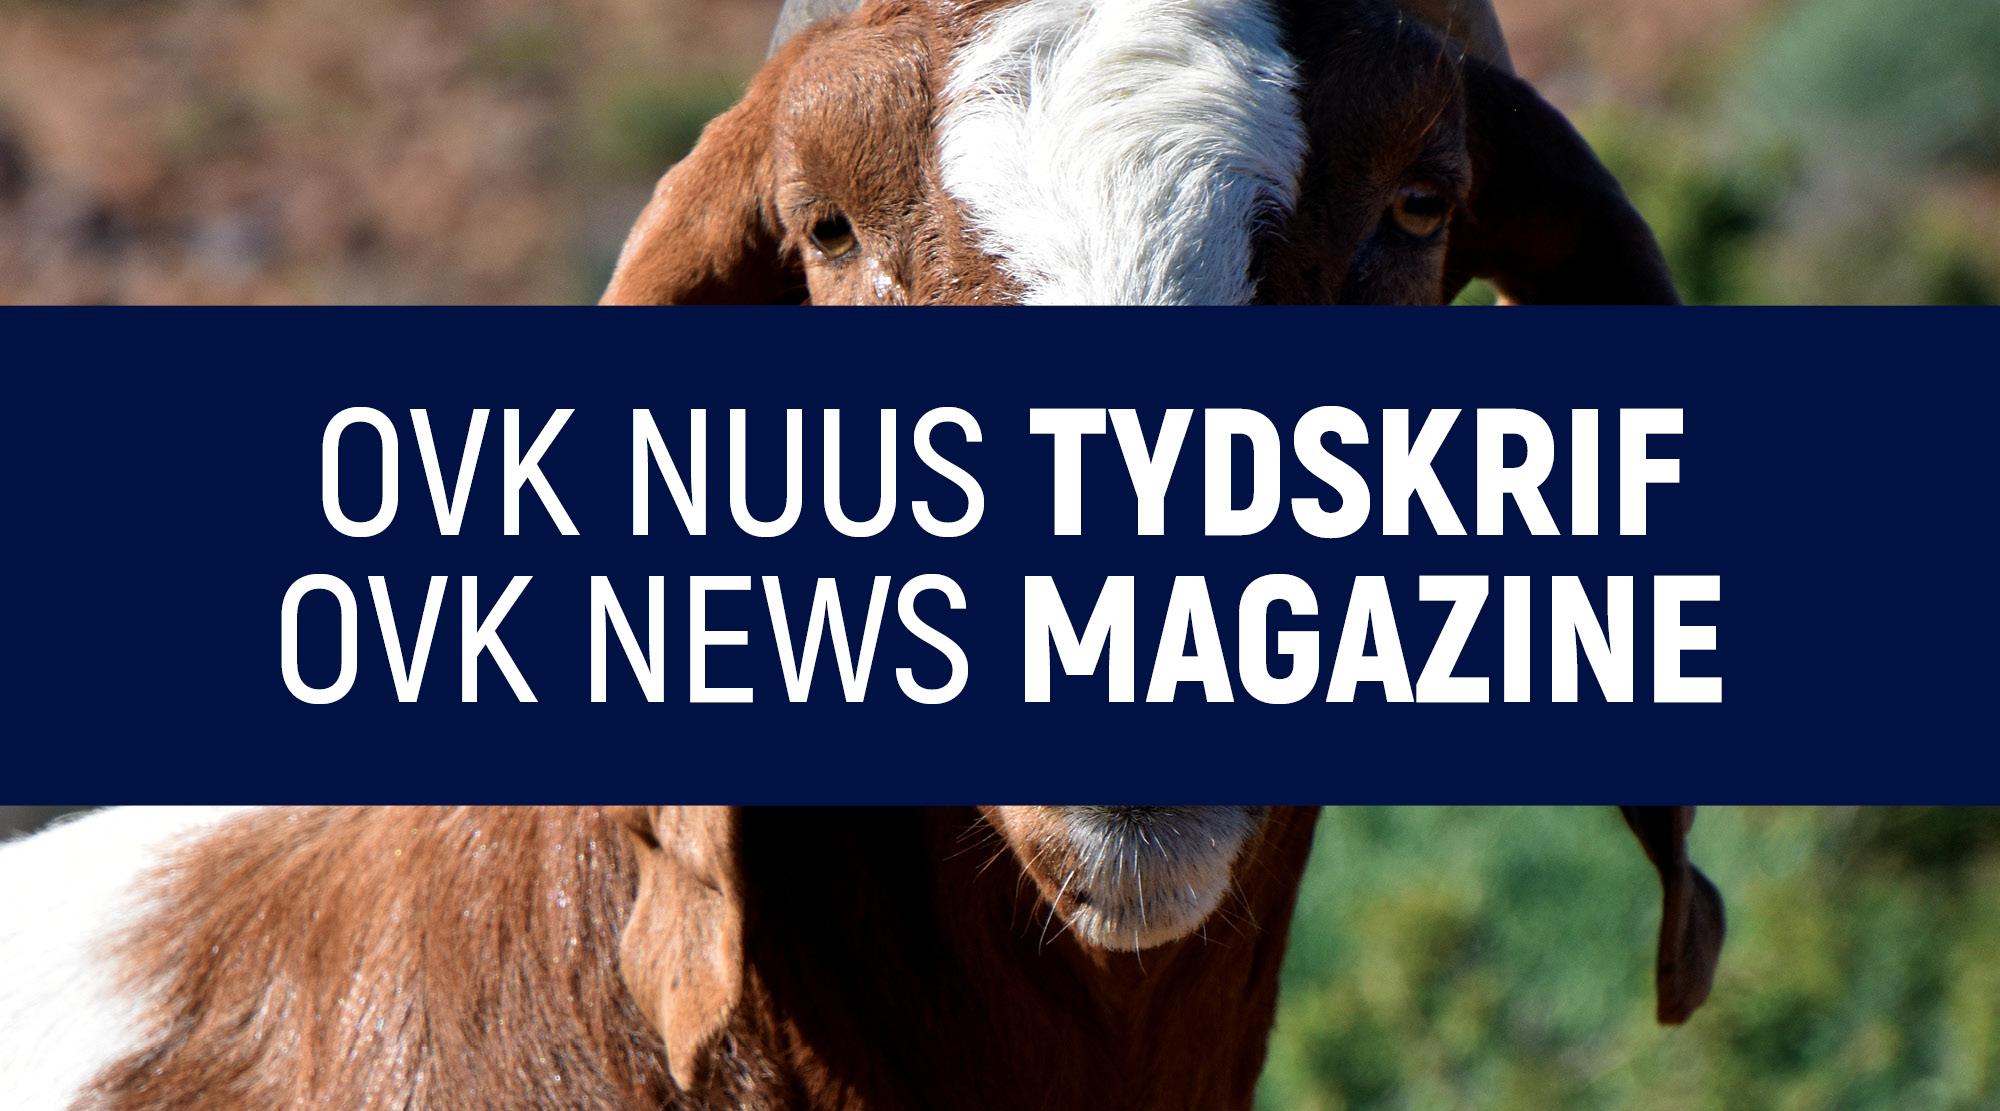 OVK Nuus Junie 2021